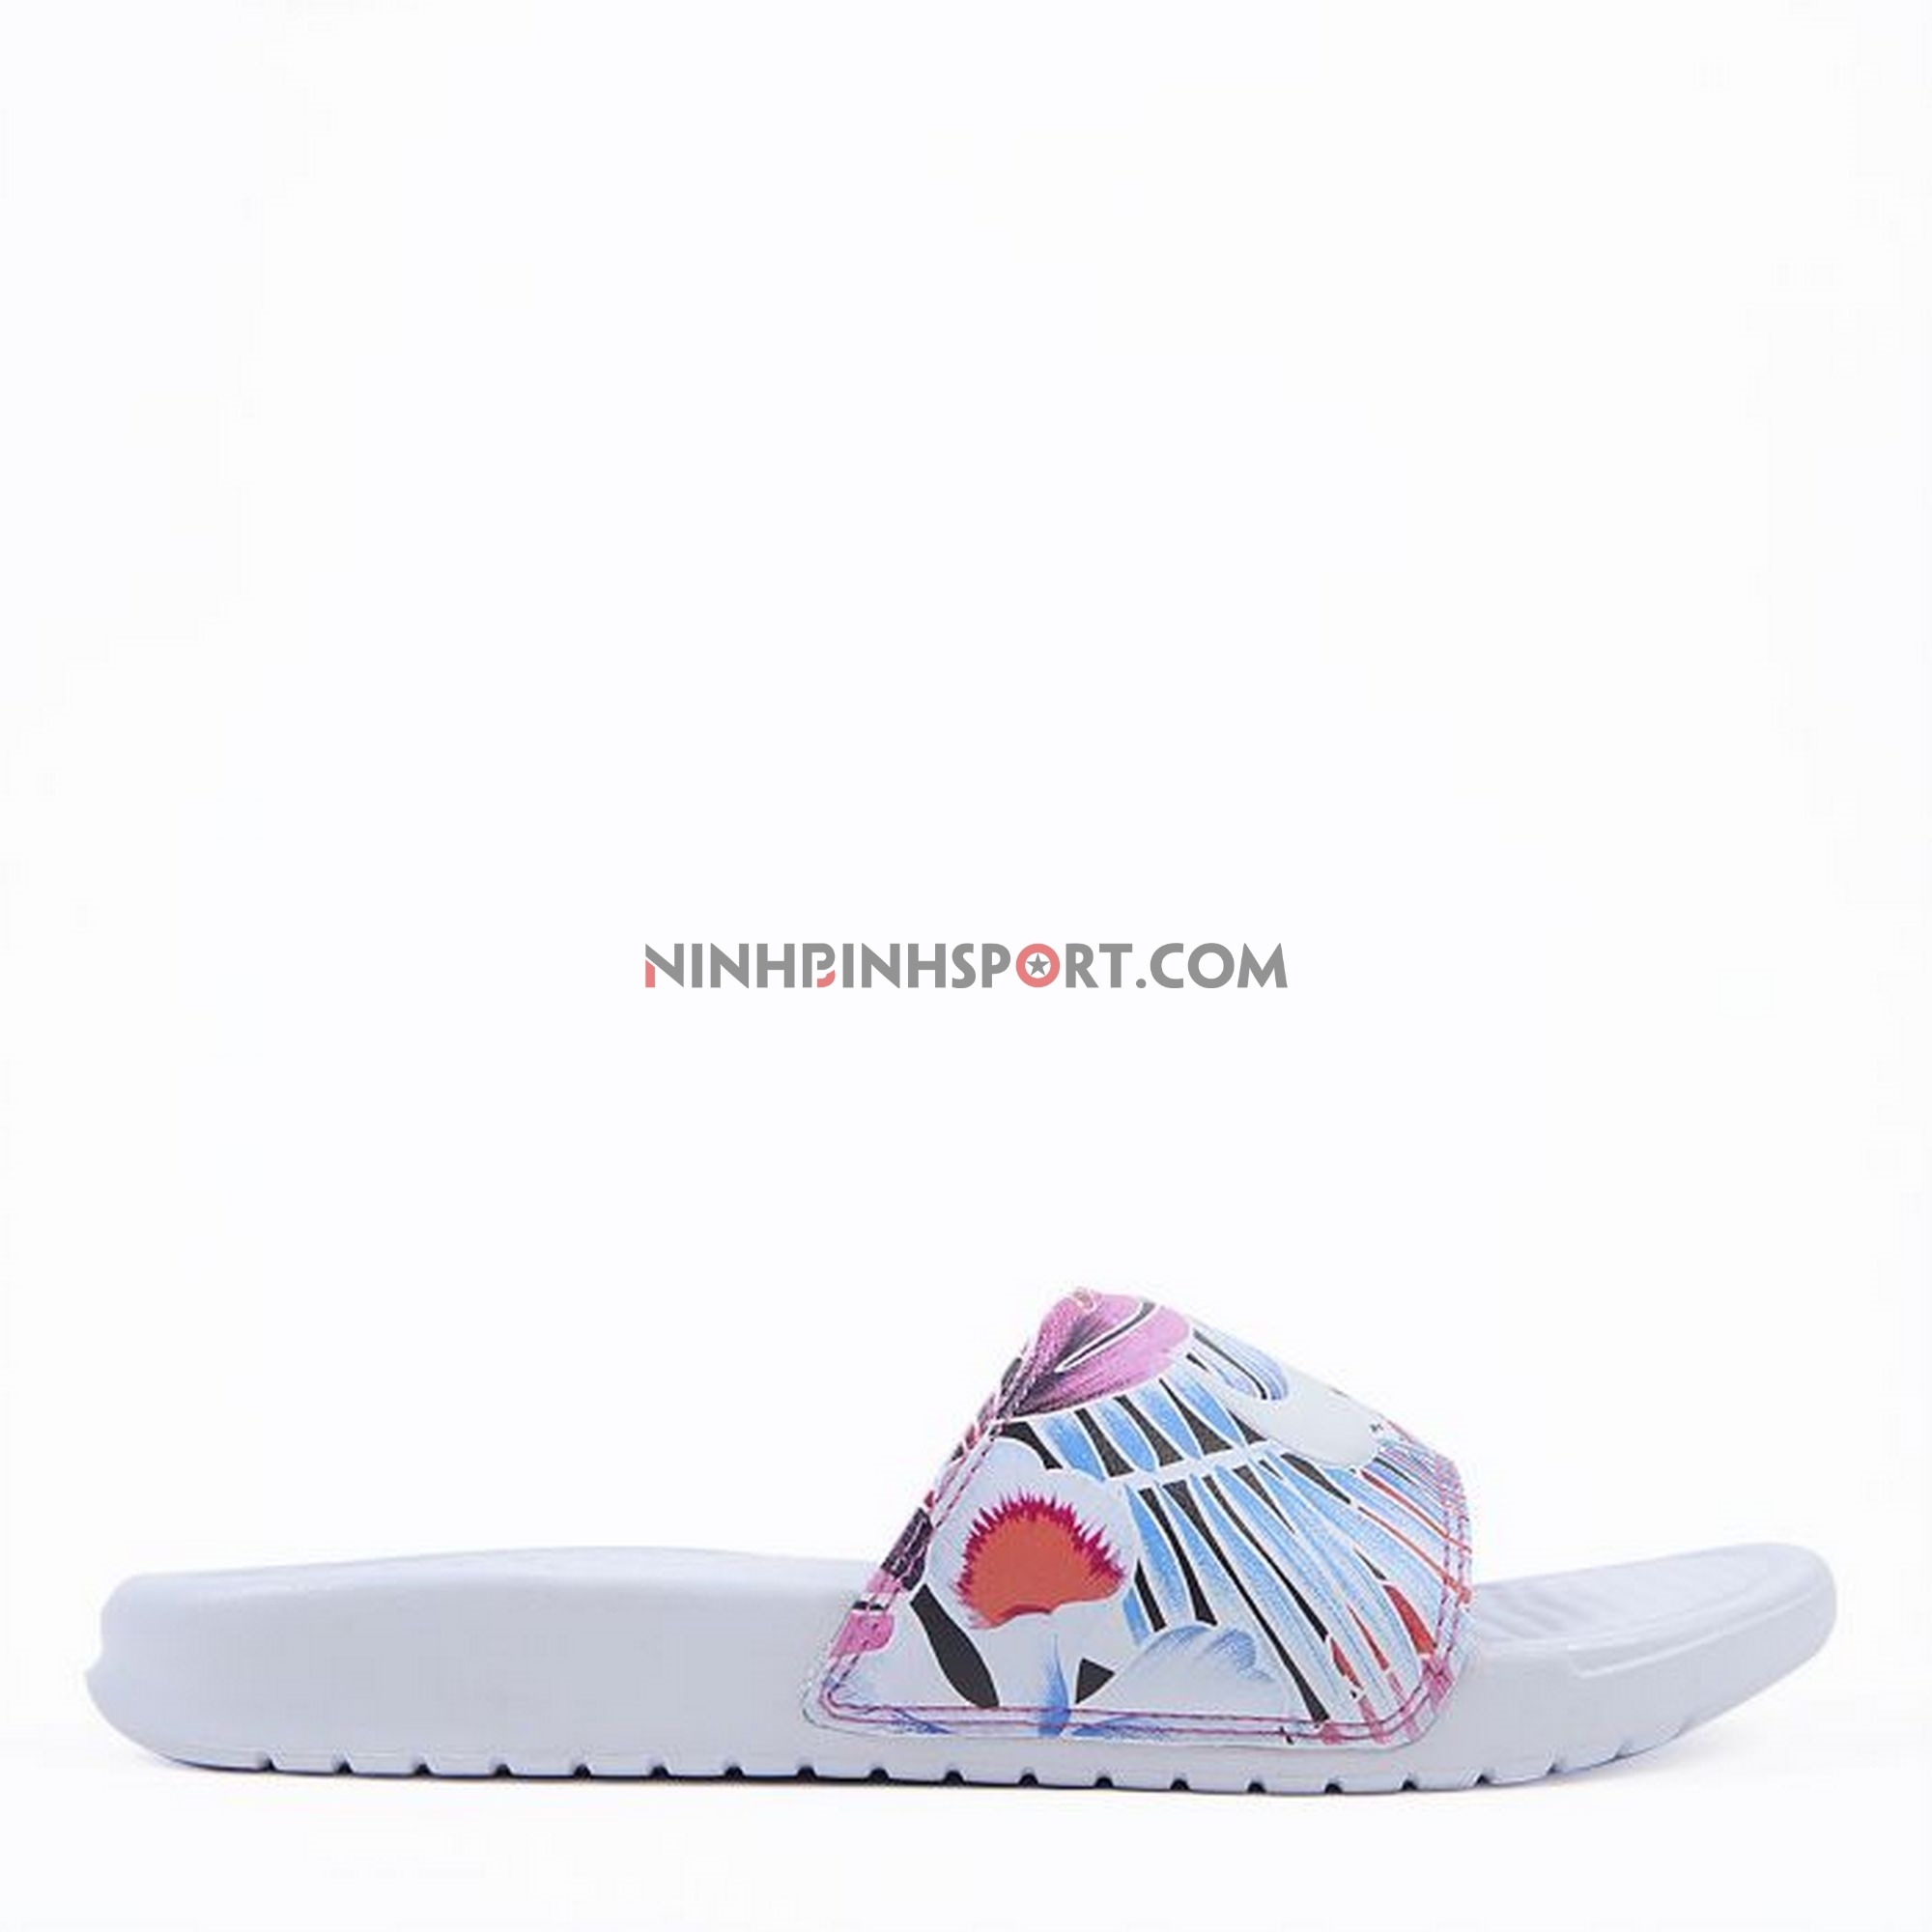 Dép thể thao nữ Nike Benassi JDI Floral 618919-113